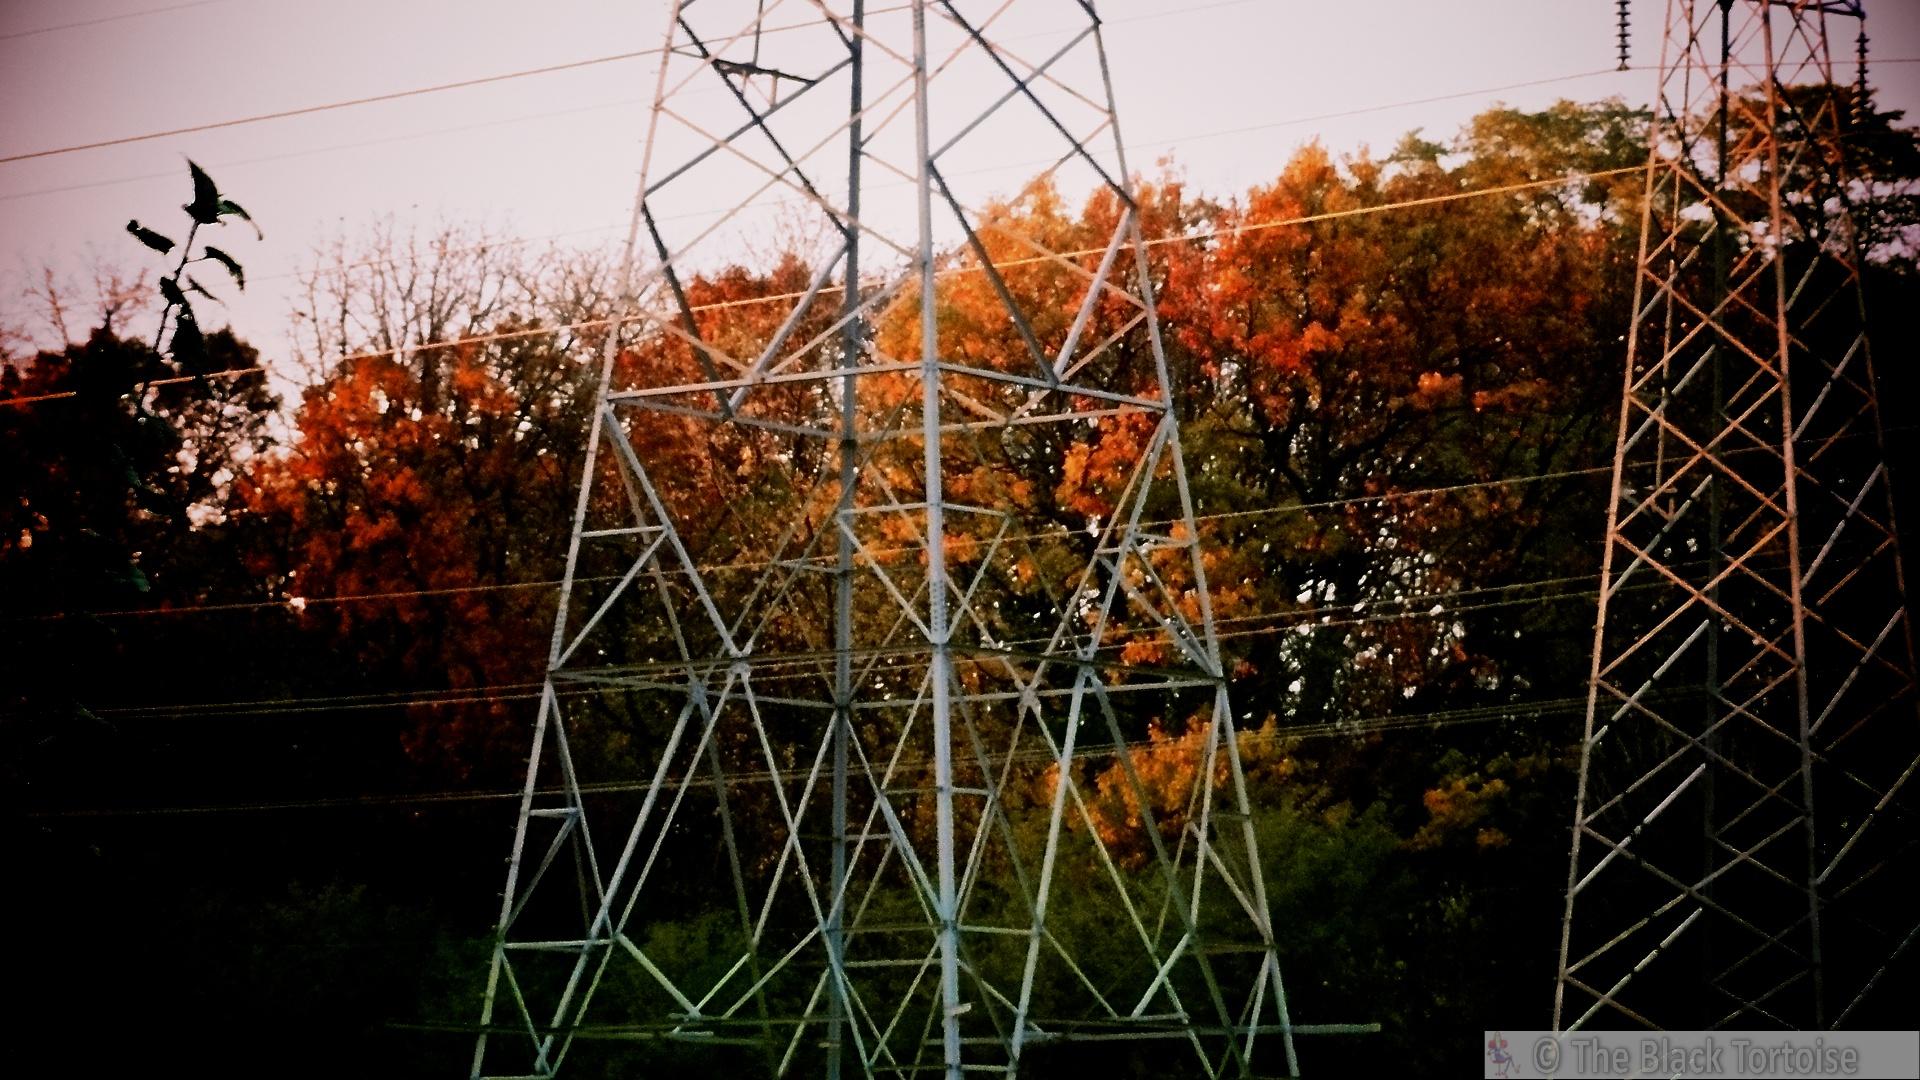 sunlight on wire3